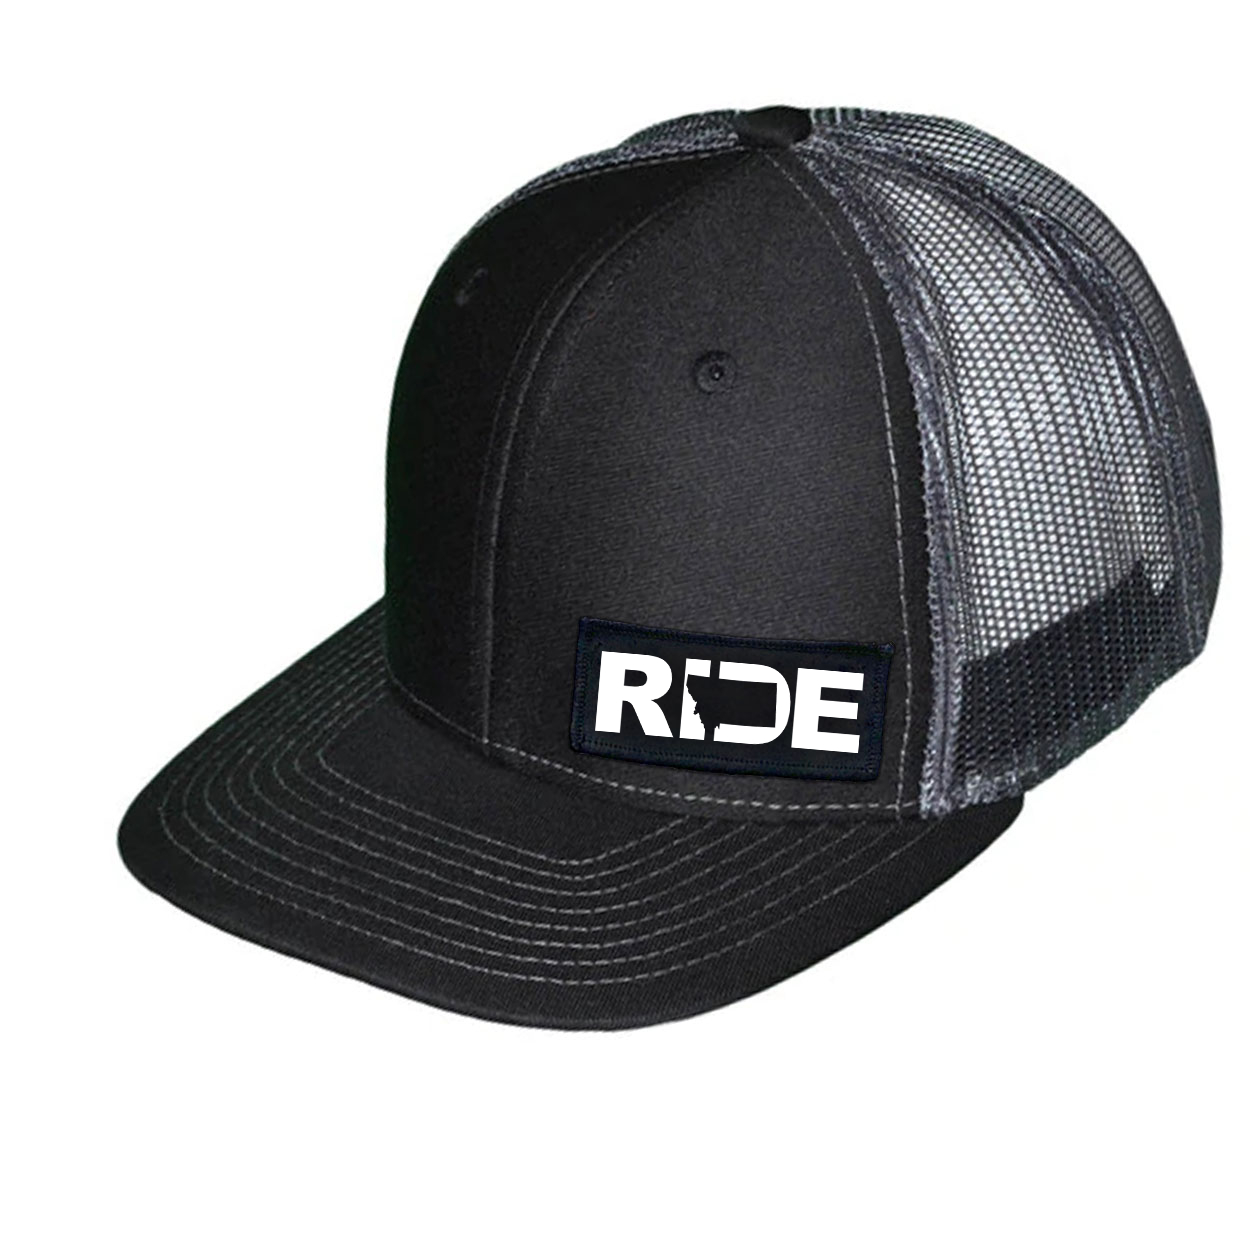 Ride Montana Night Out Woven Patch Snapback Trucker Hat Black/Dark Gray (White Logo)